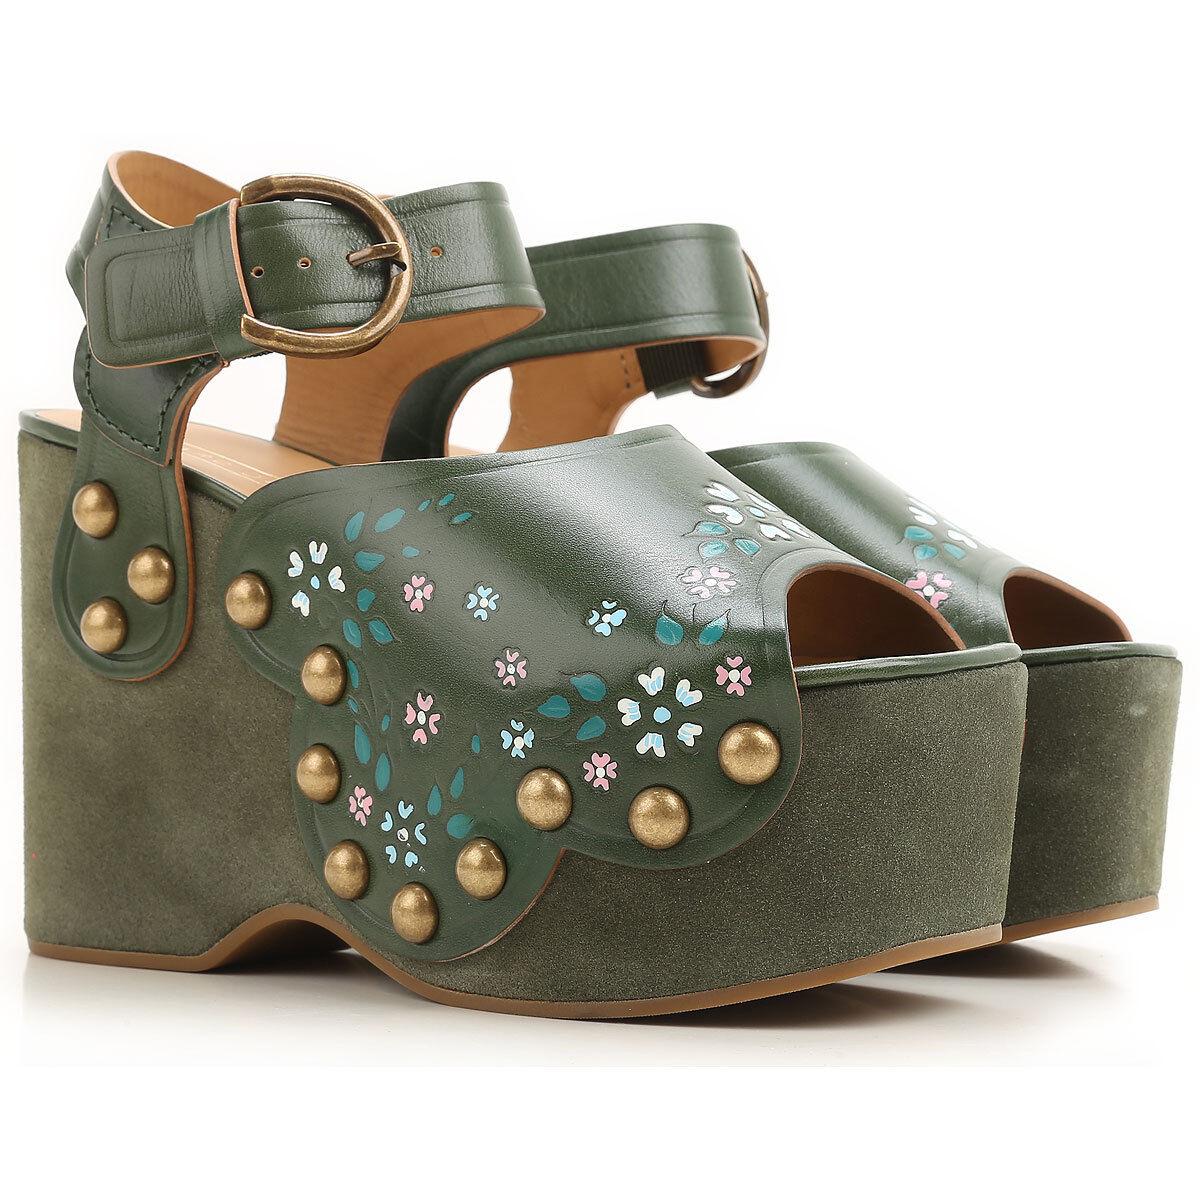 Marc Jacobs Sandalo dawn, Dawn wedge sandals | Vendita Calda  | Scolaro/Signora Scarpa